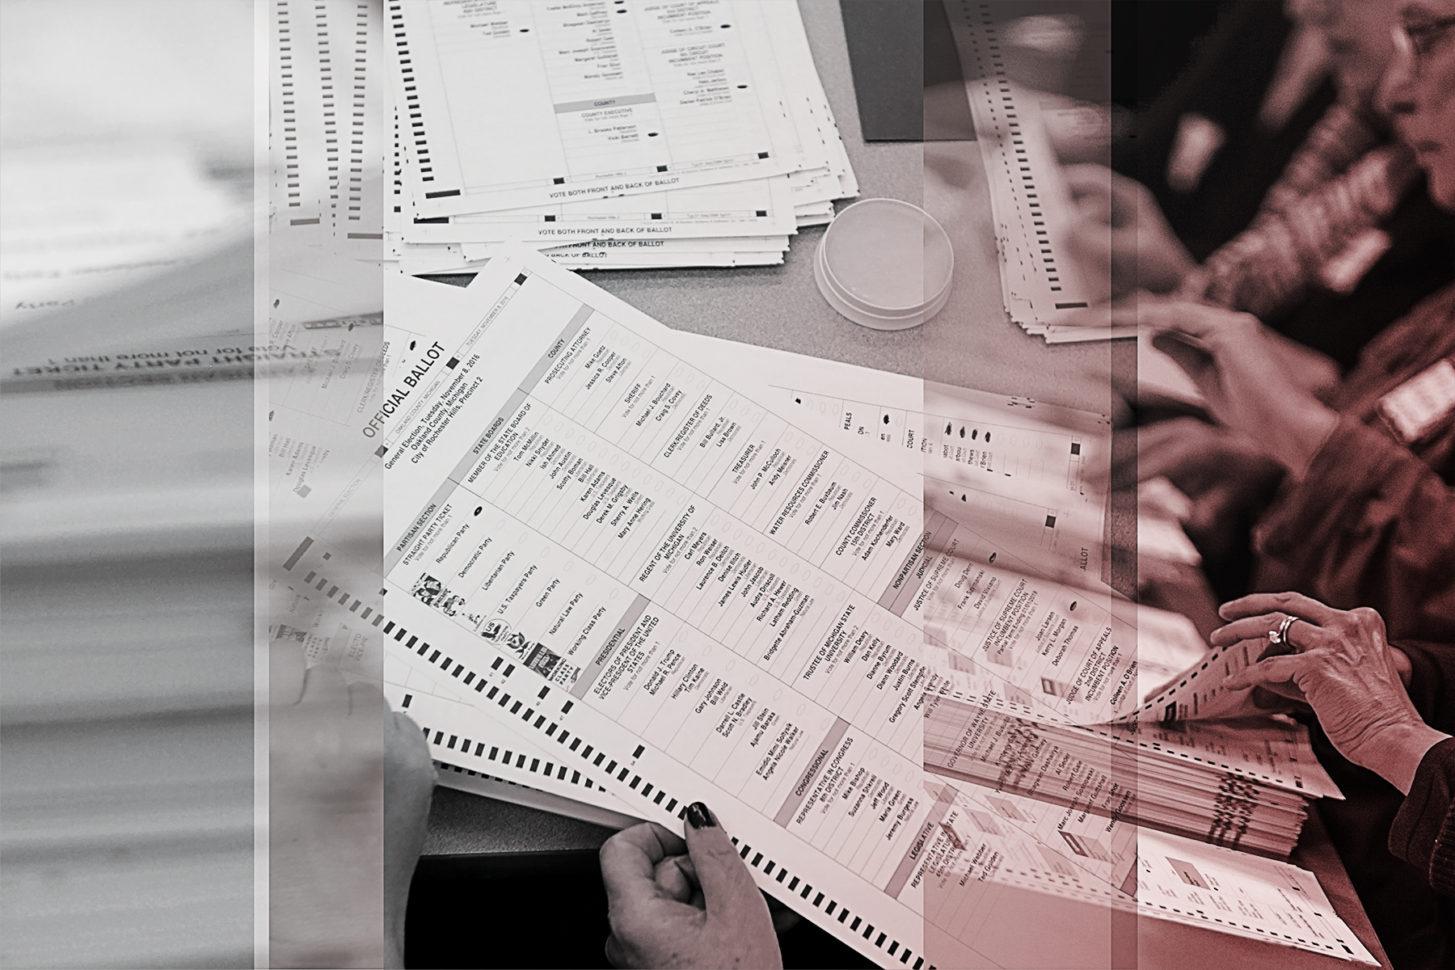 Ballot Counting Spreadsheet Regarding Inside The Recount  The New Republic